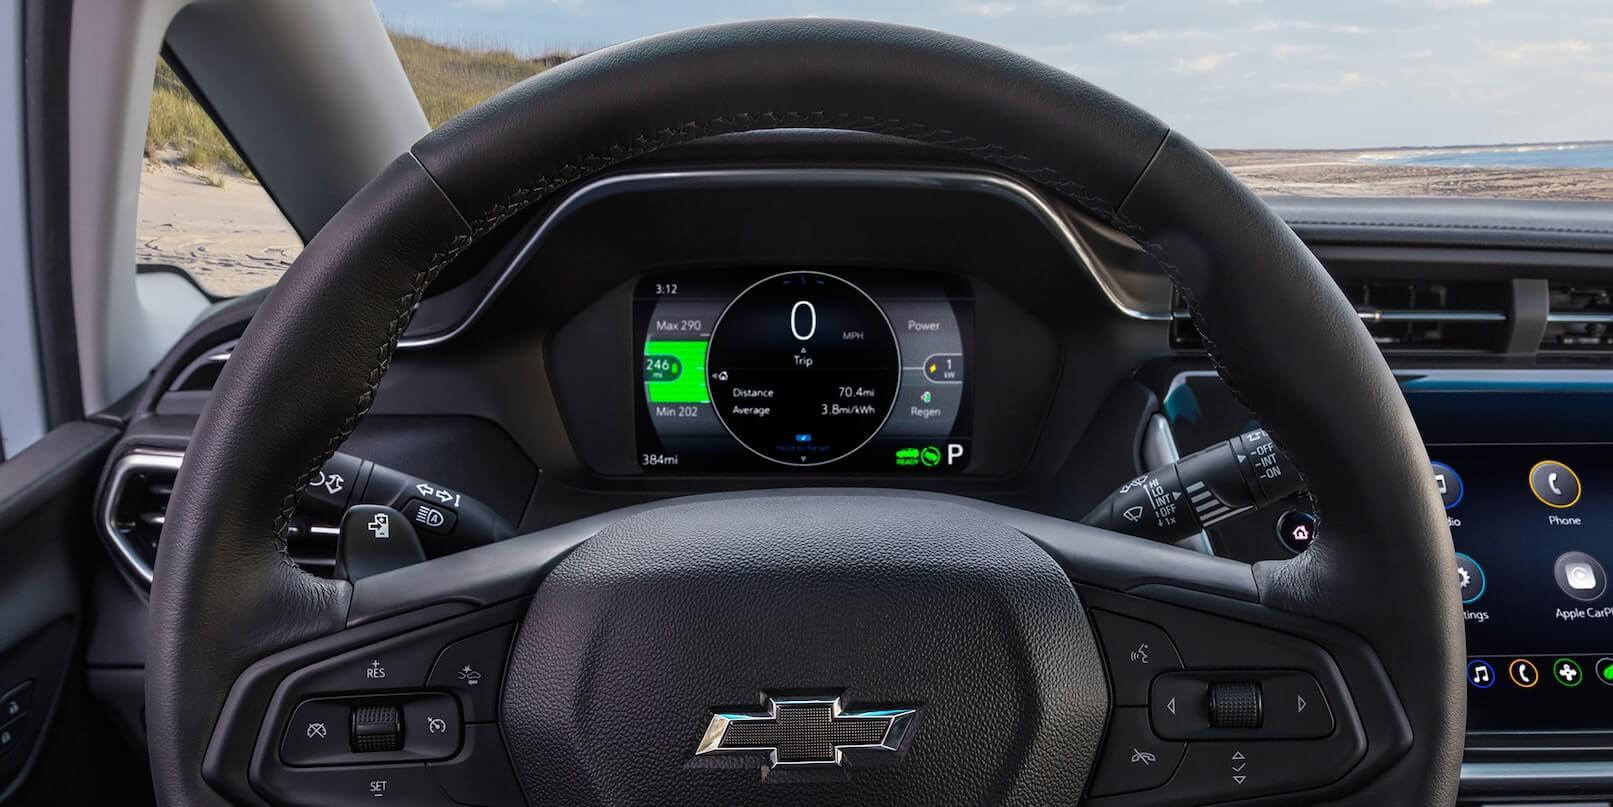 2022 Bolt EV steering wheel and dashboard.